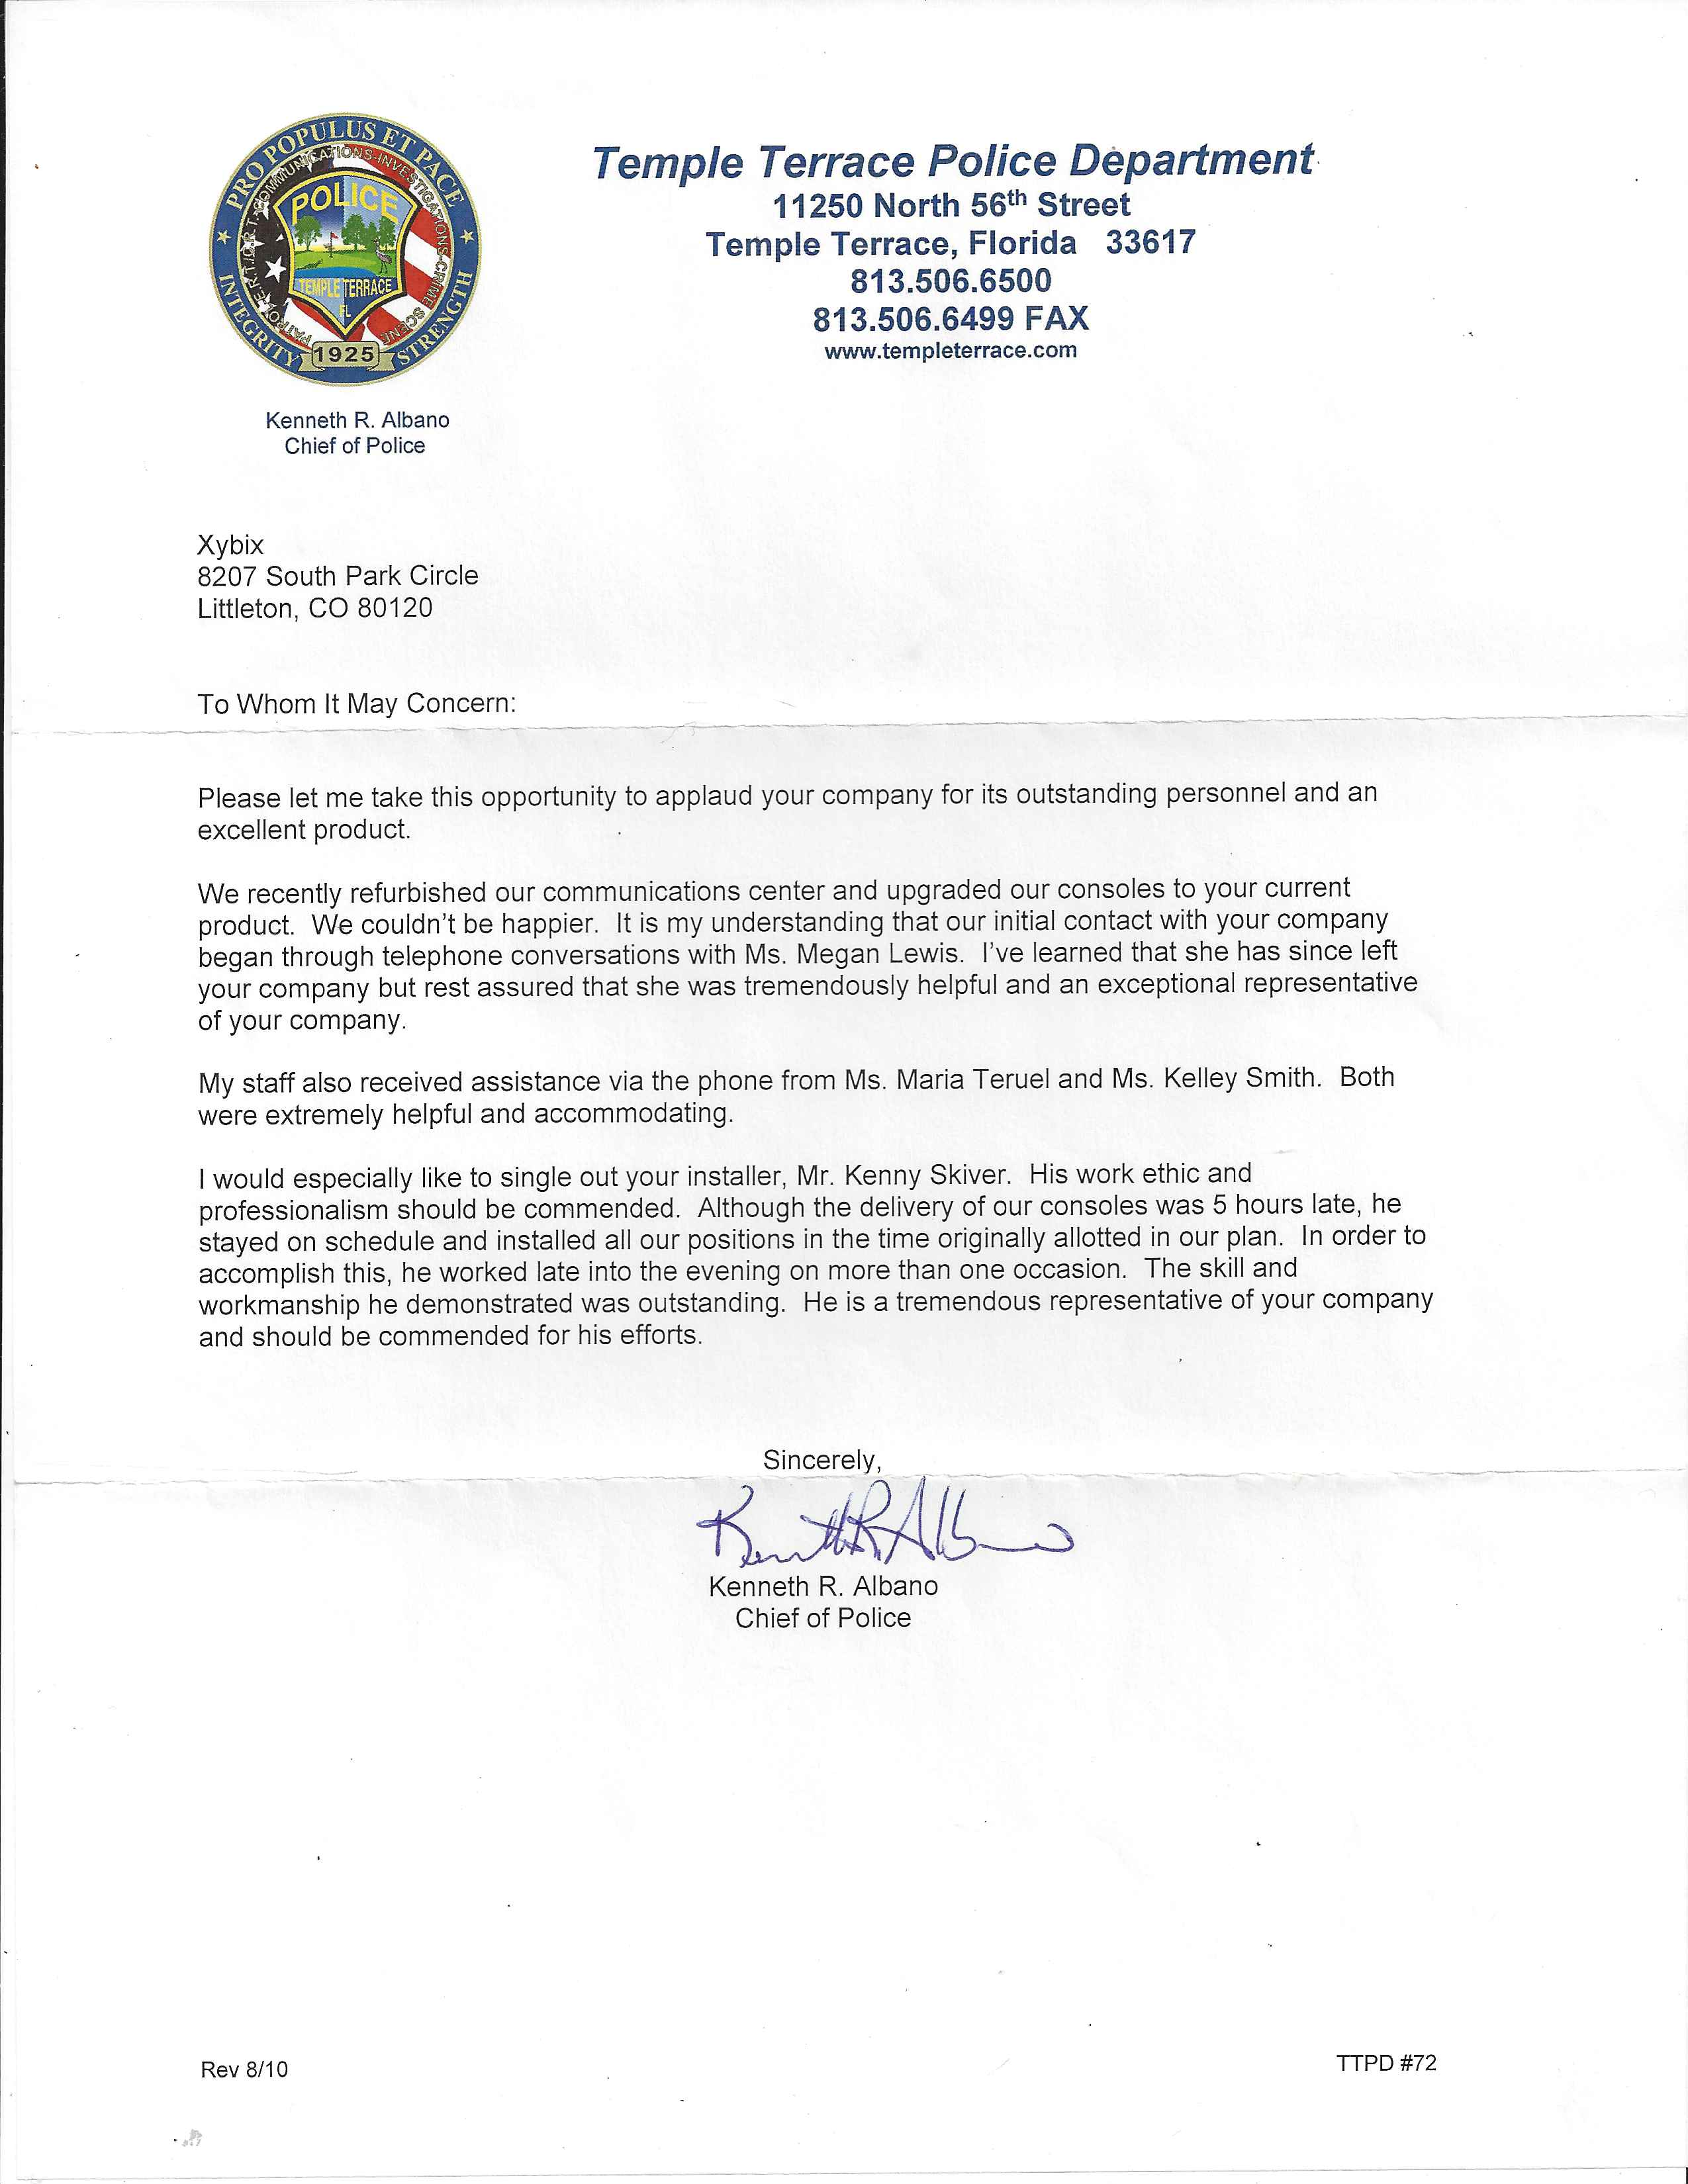 Temple Terrace Police Department Letter